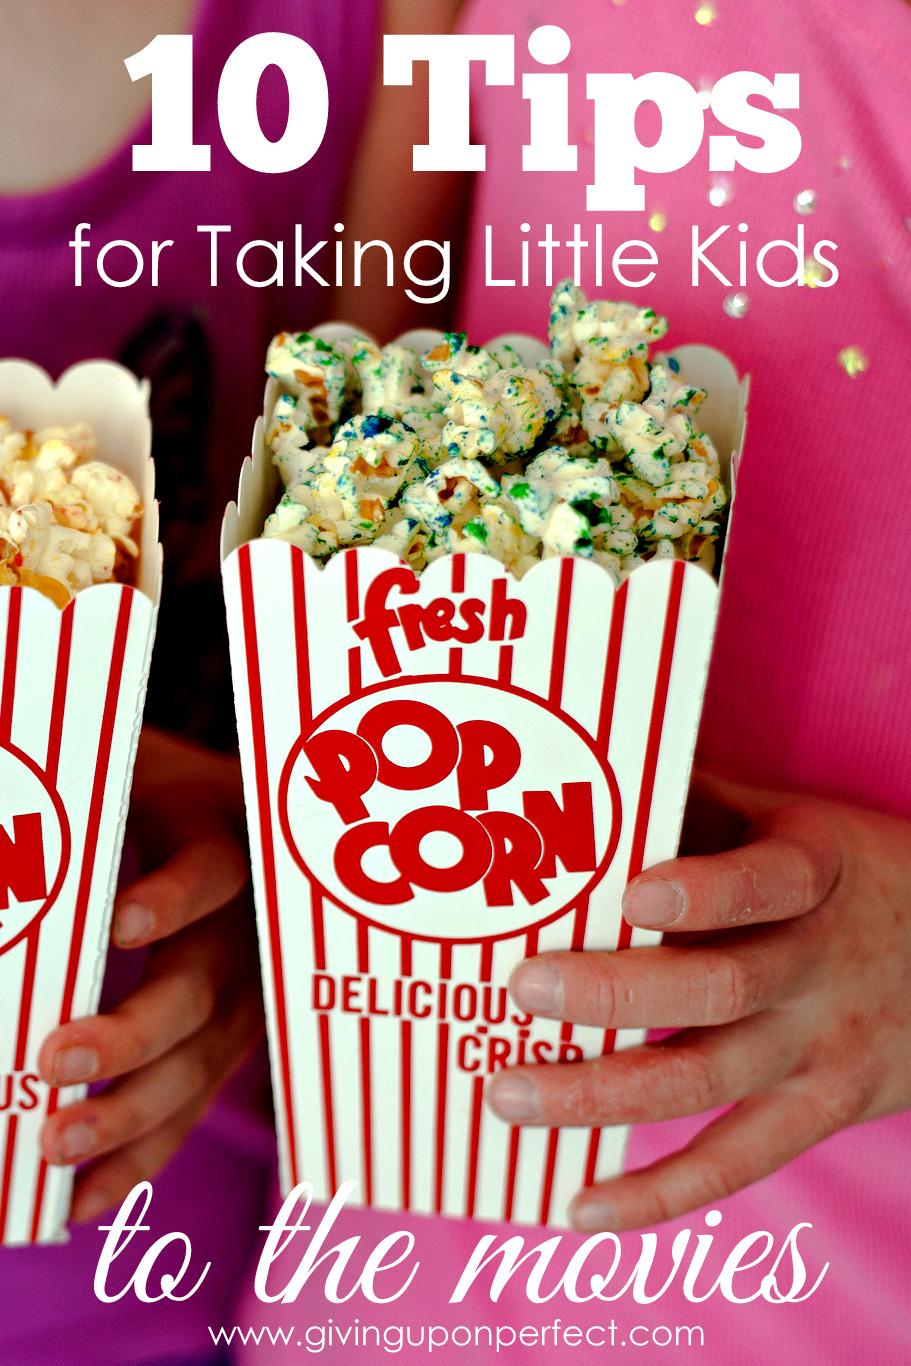 WFMW: Taking Kids to the Movies